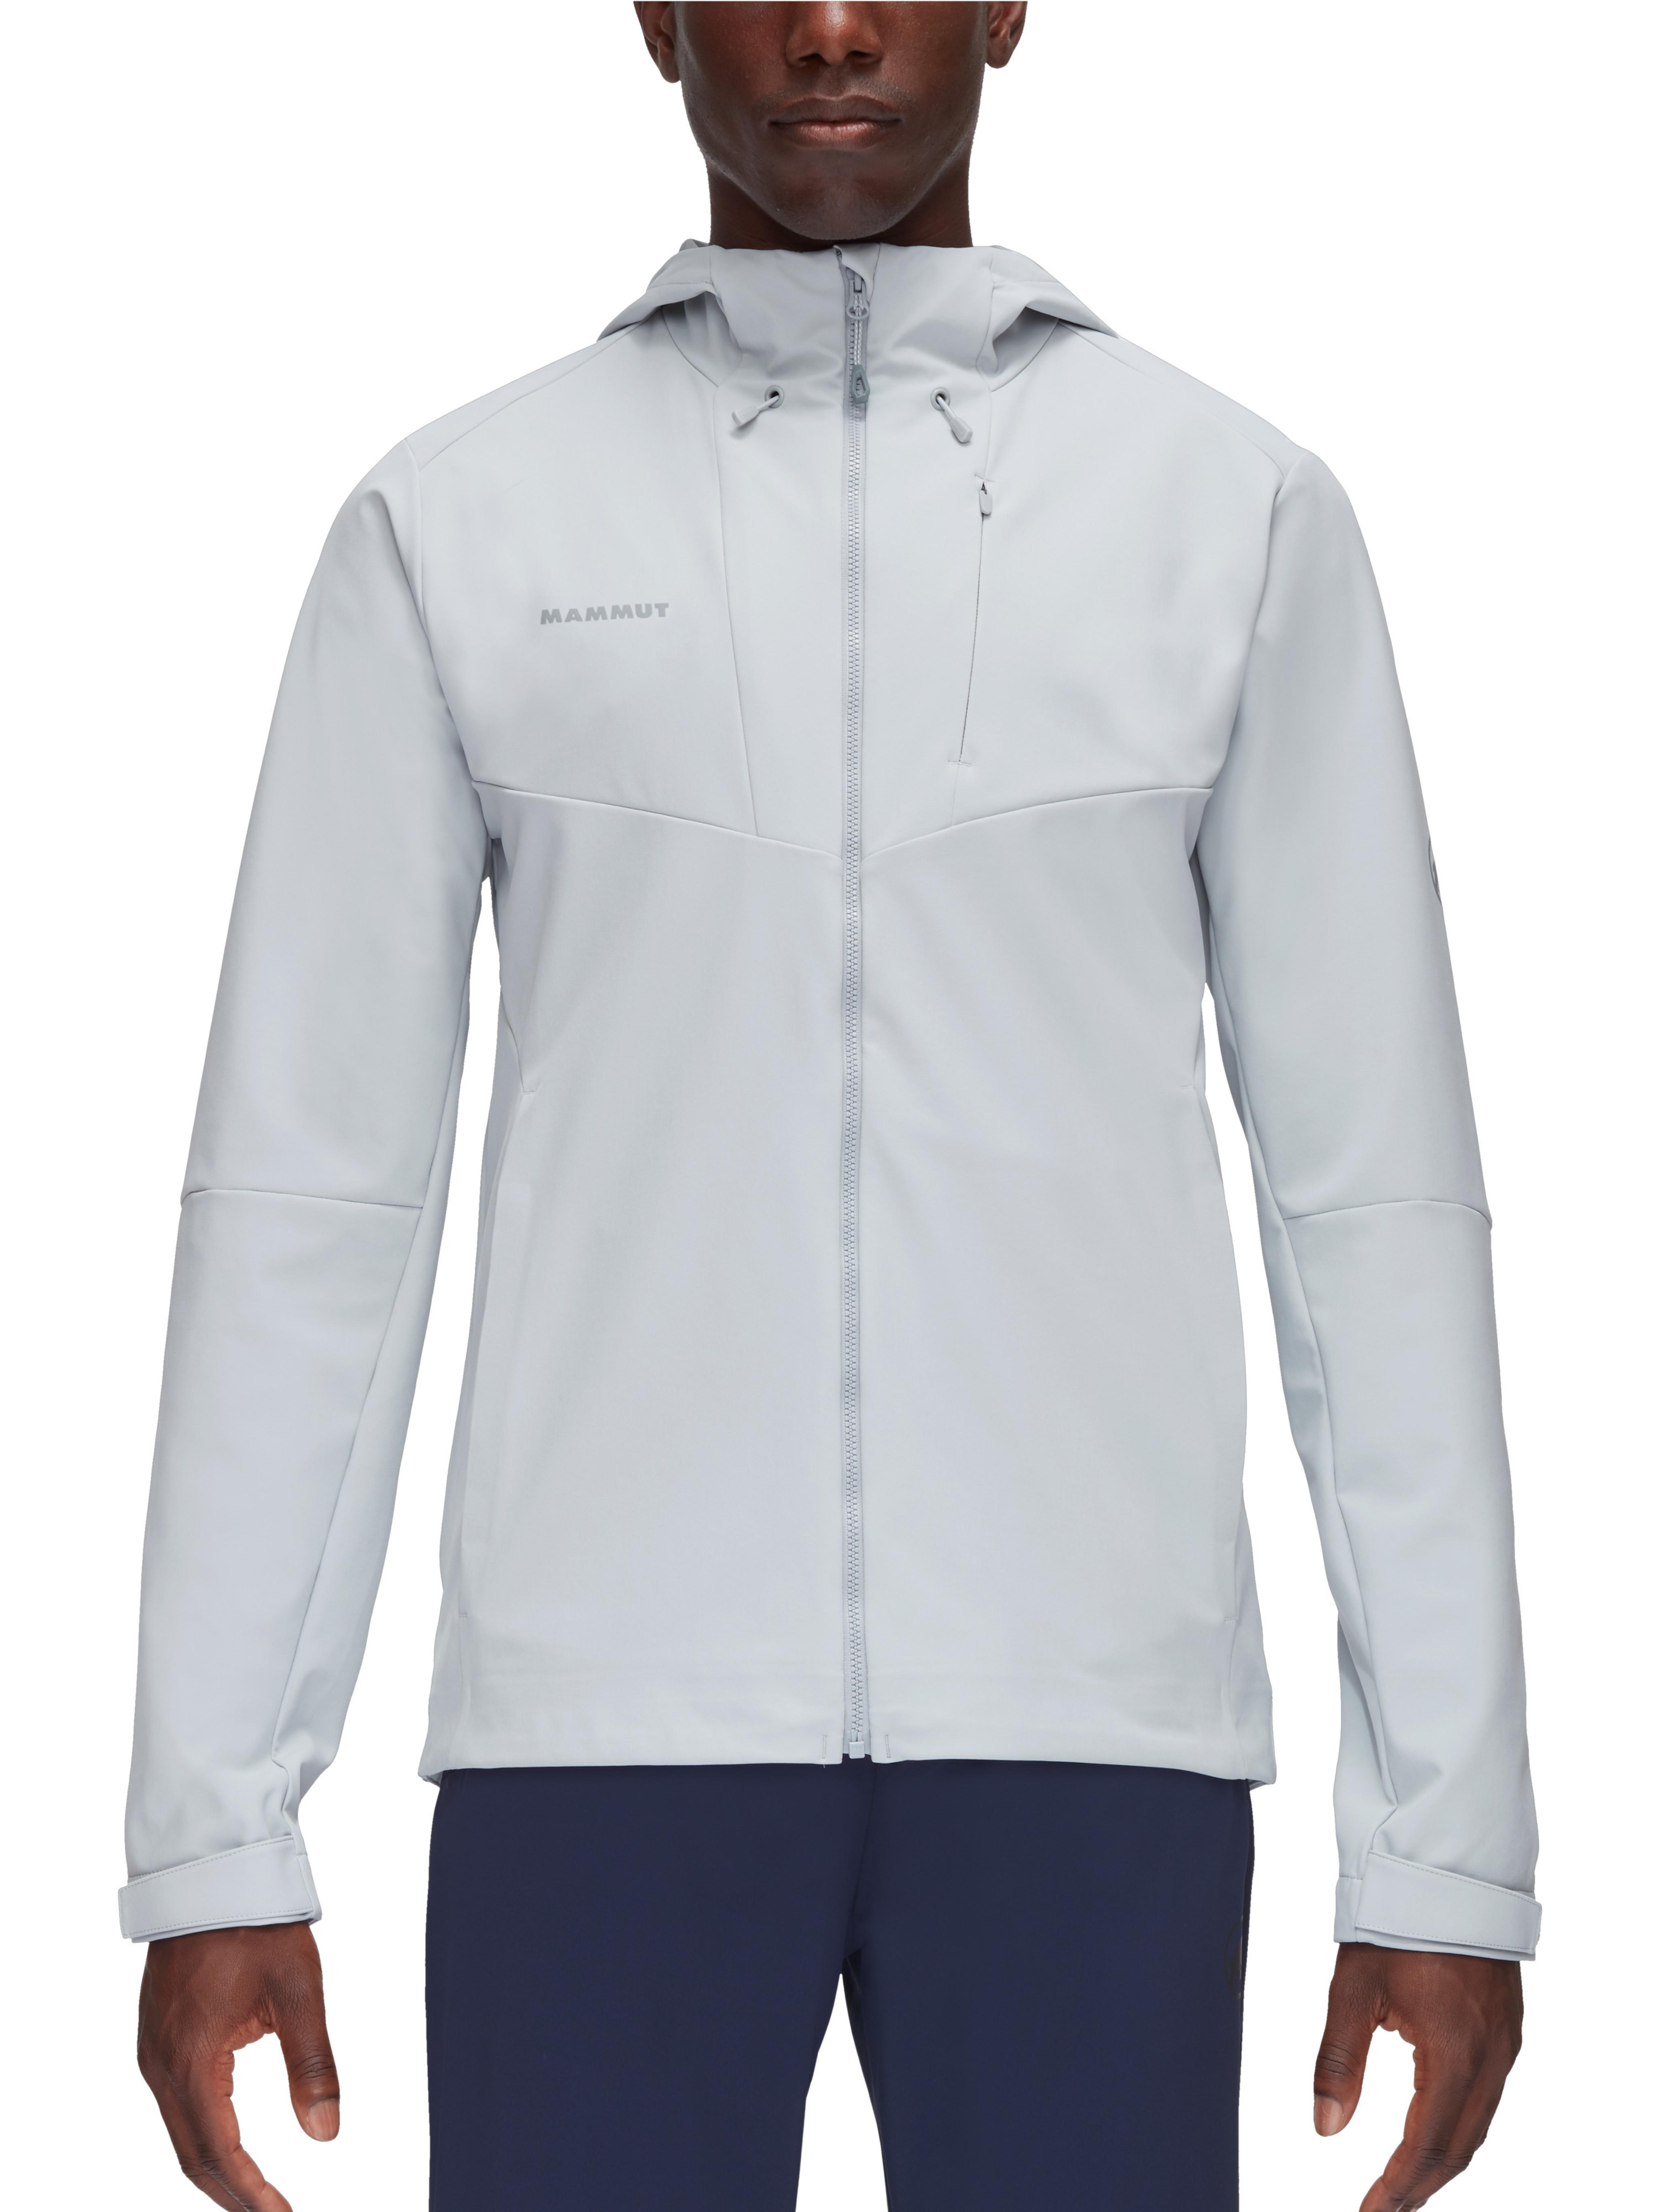 Sapuen SO Hooded Jacket Men product image